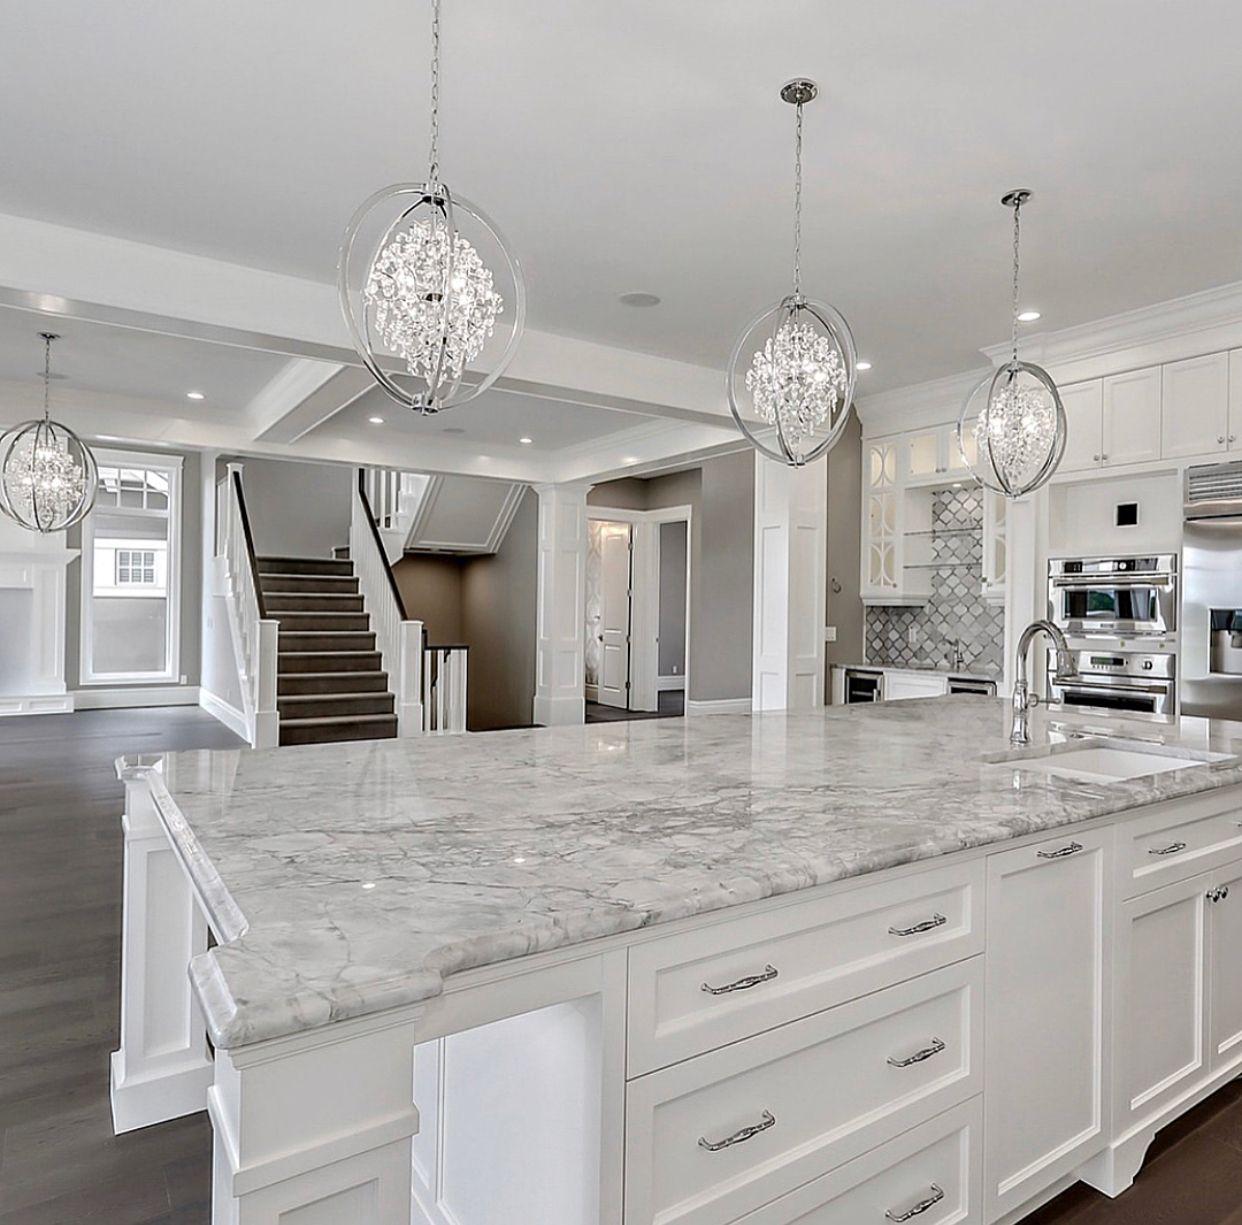 Inspire Me Home Decor White Kitchen Remodeling Home Decor Kitchen Kitchen Inspirations